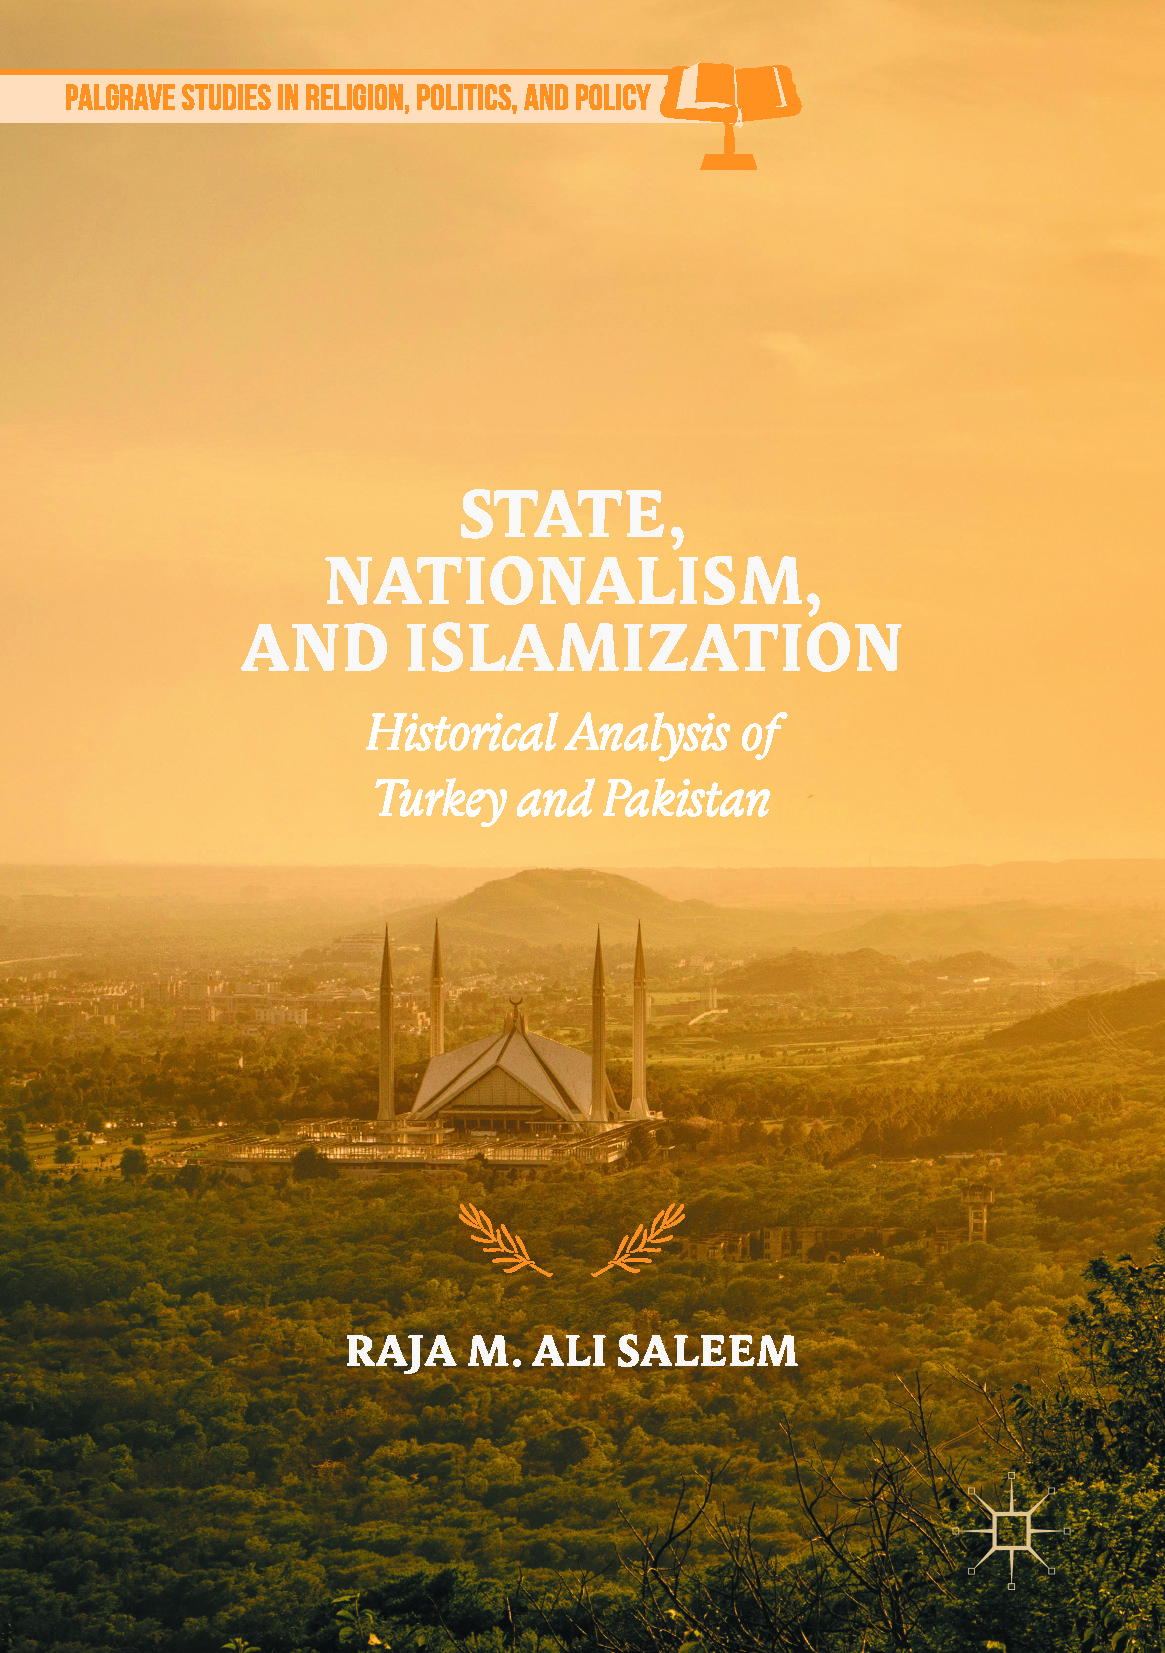 Saleem, Raja M. Ali - State, Nationalism, and Islamization, ebook